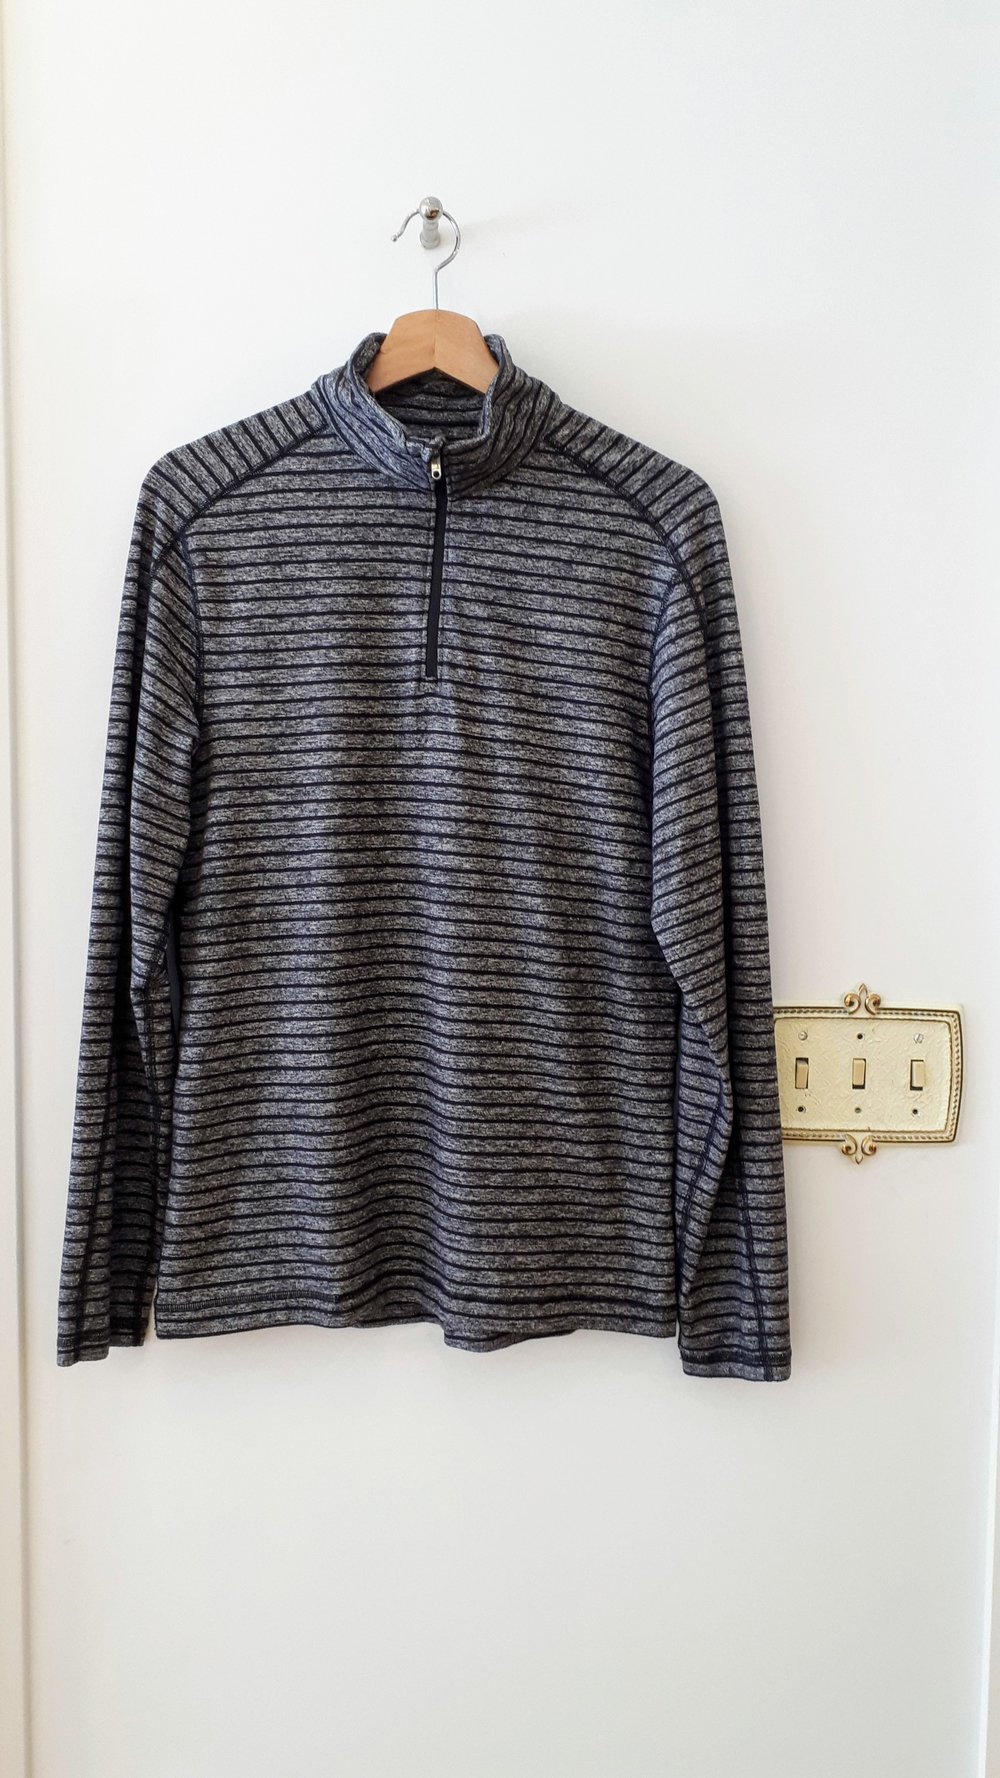 Lululemon top; Mens size M, $38